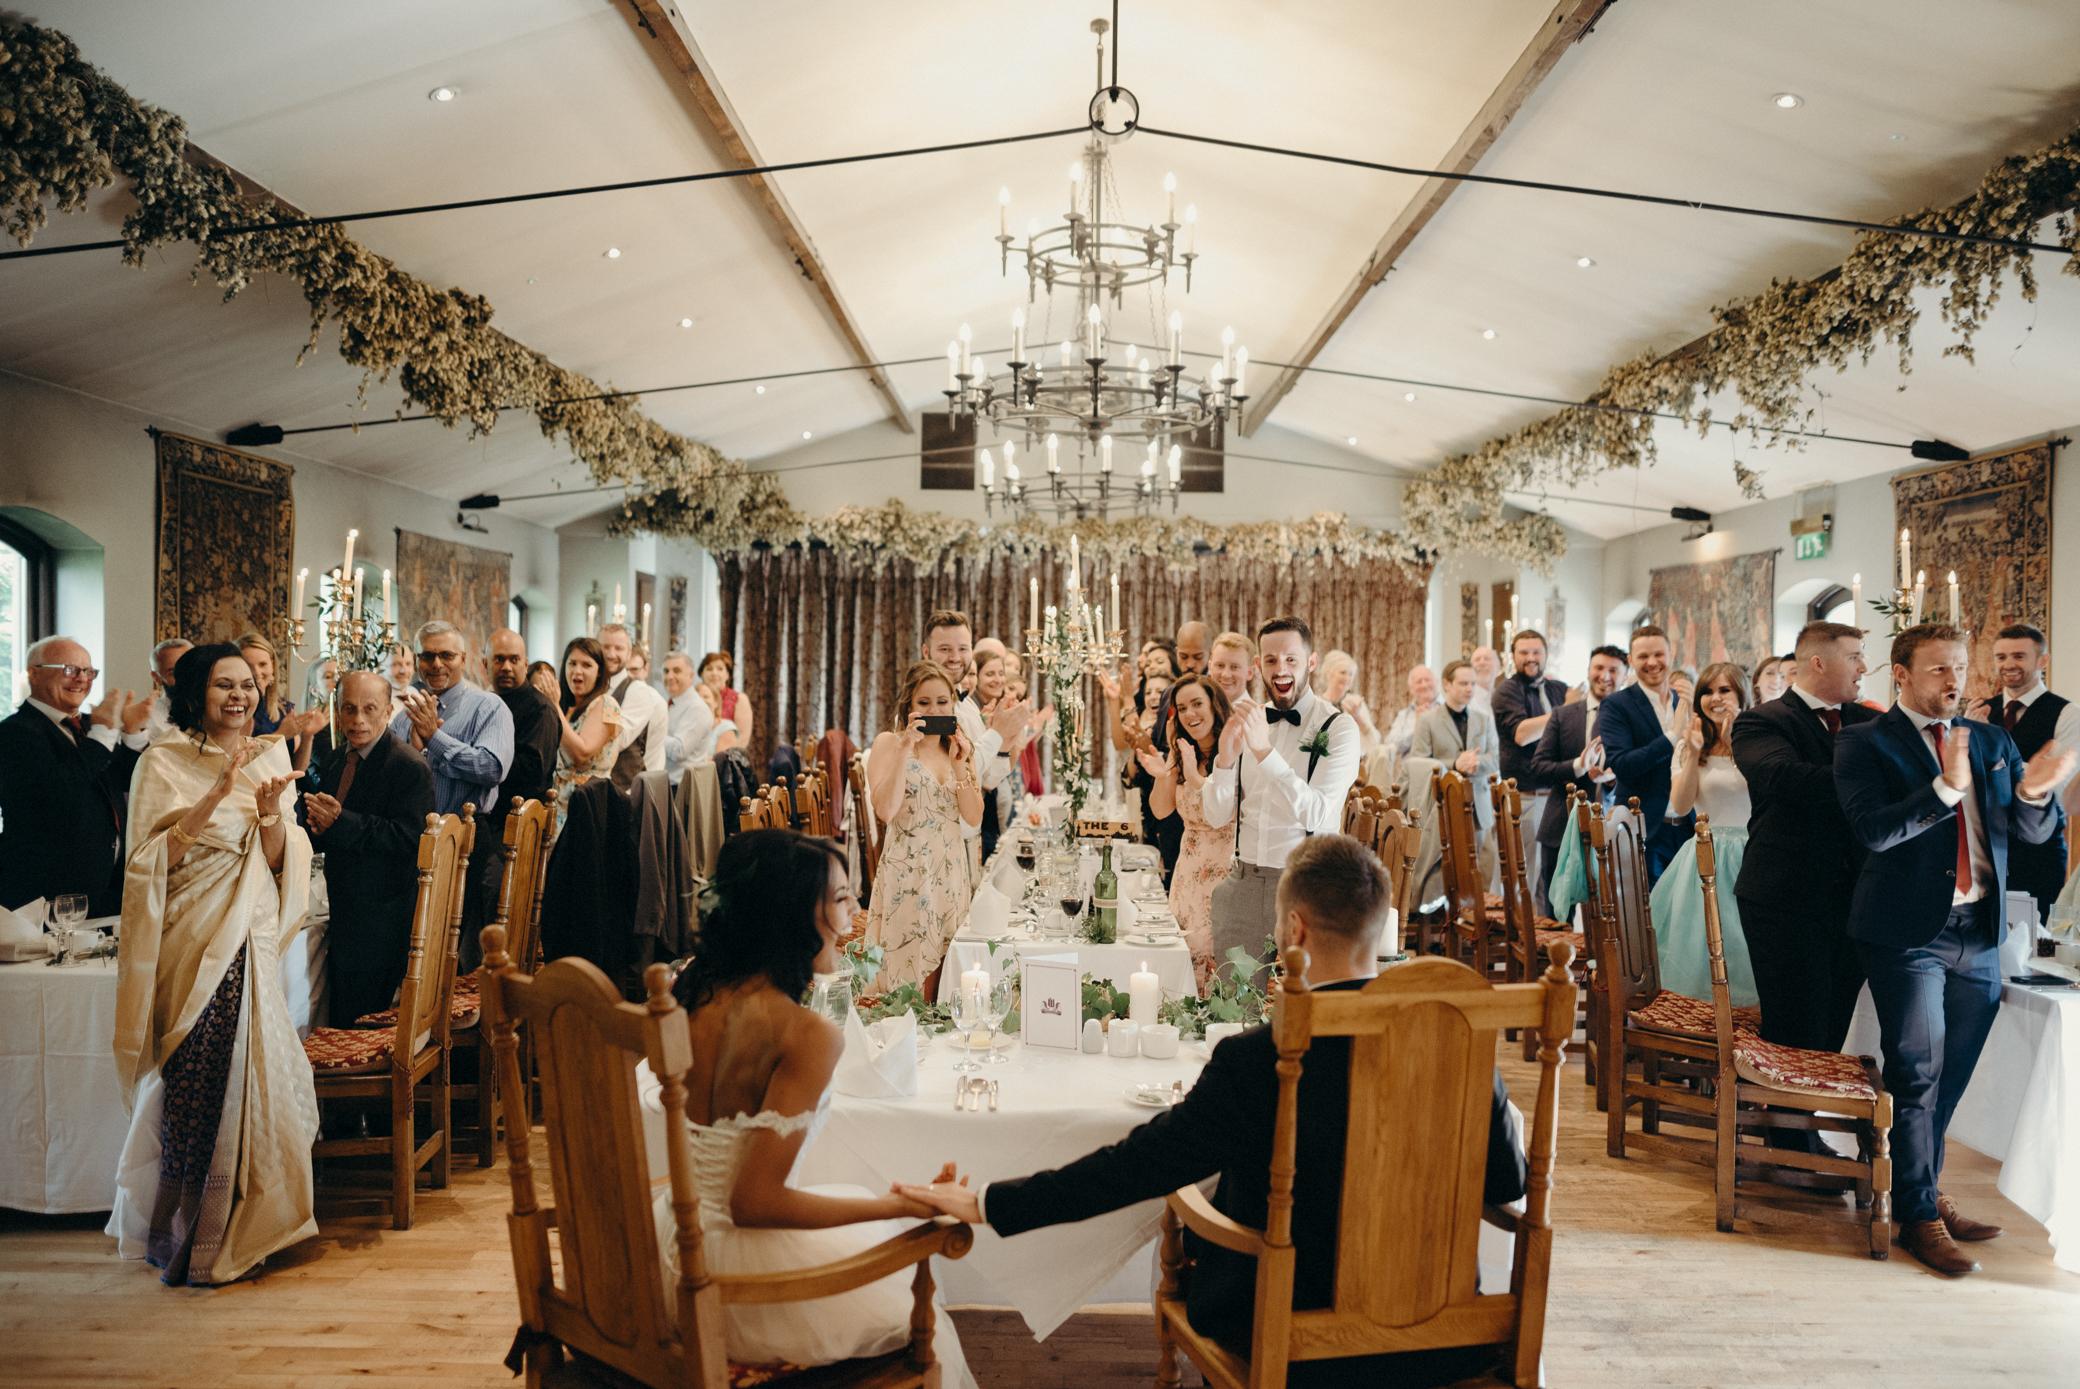 Alan&Naz- Barberstown Castle Wedding - Wedding photographer Ireland-179.jpg